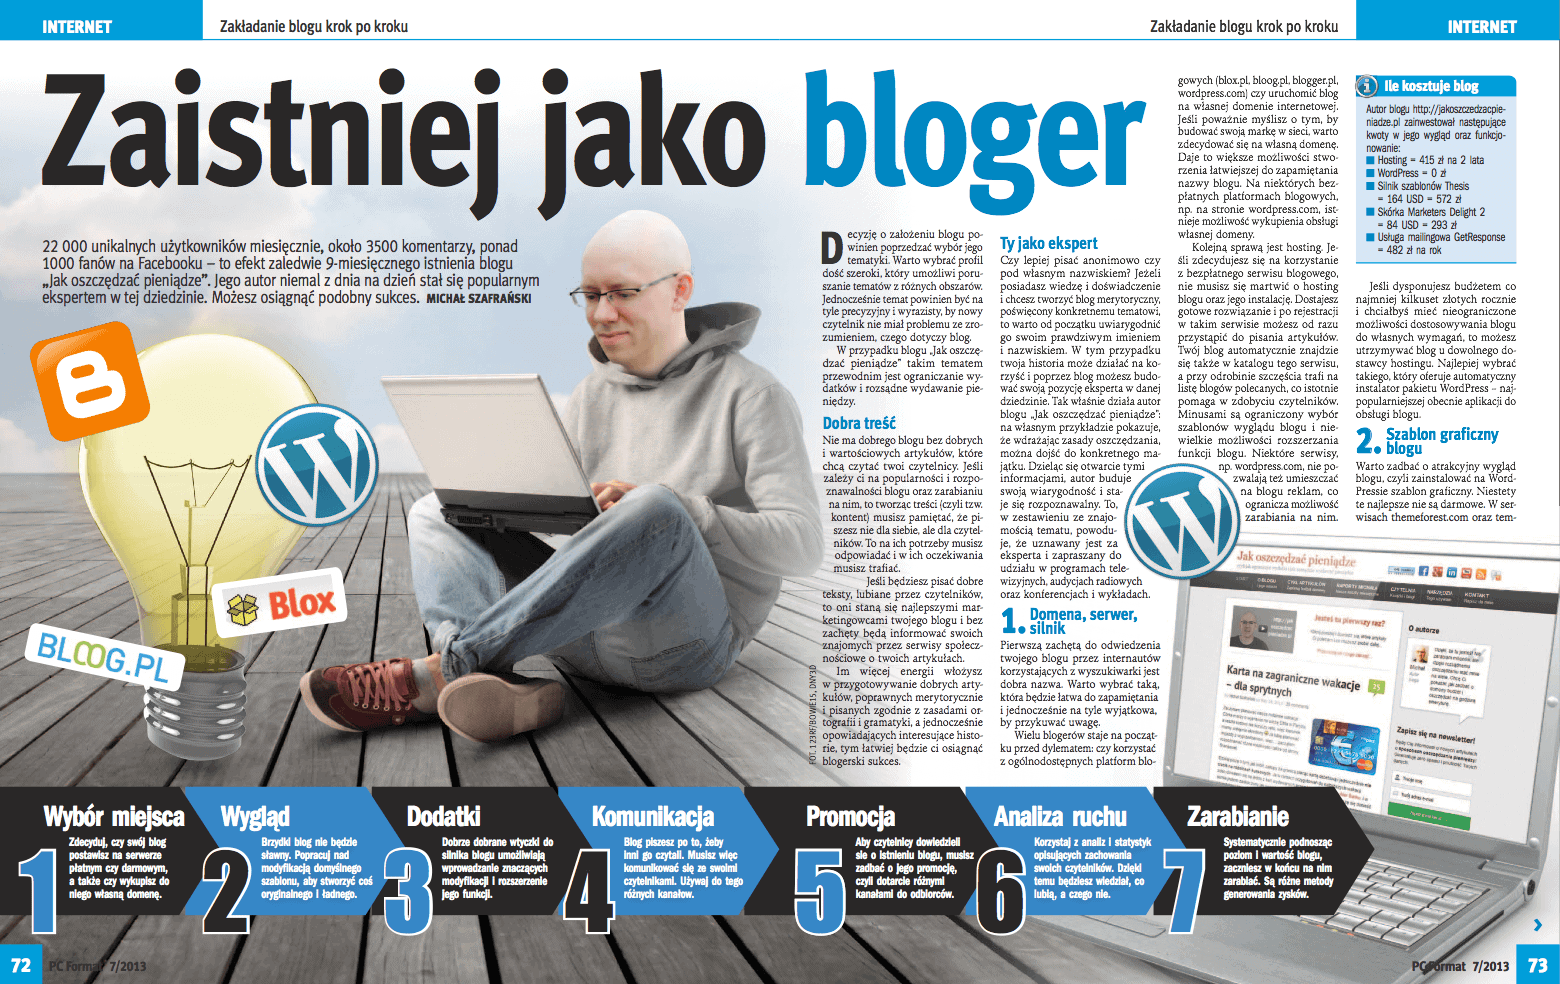 Zaistniej jako bloger